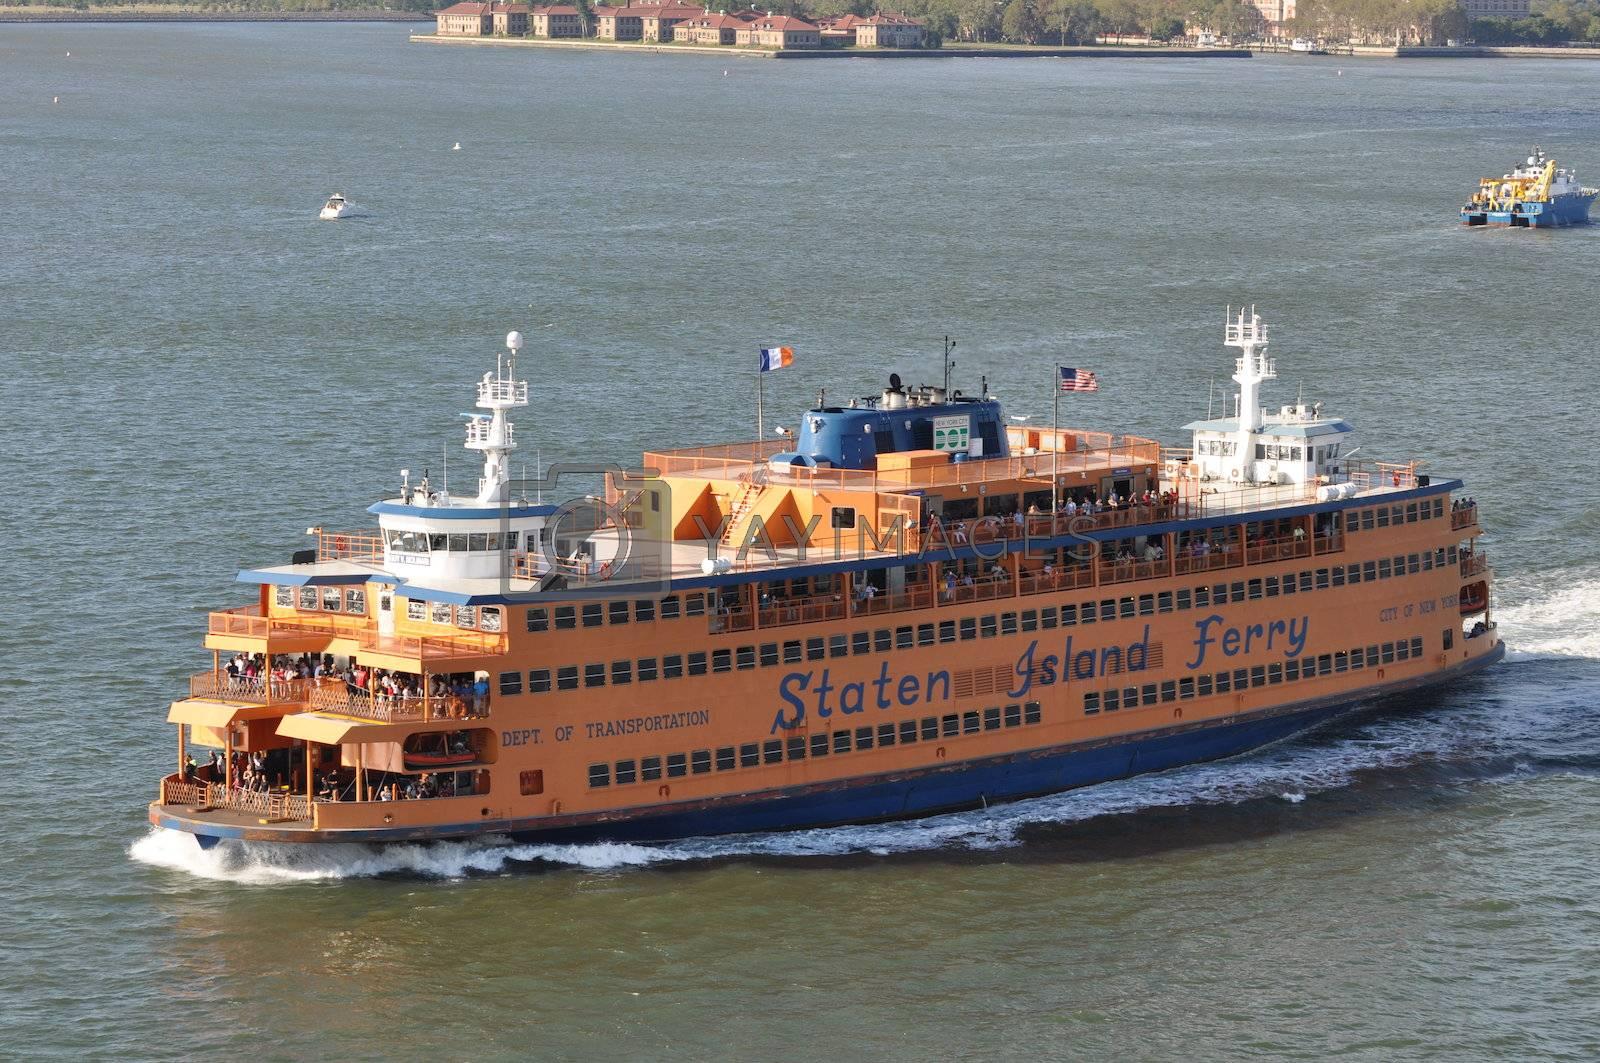 Staten Island Ferry in New York